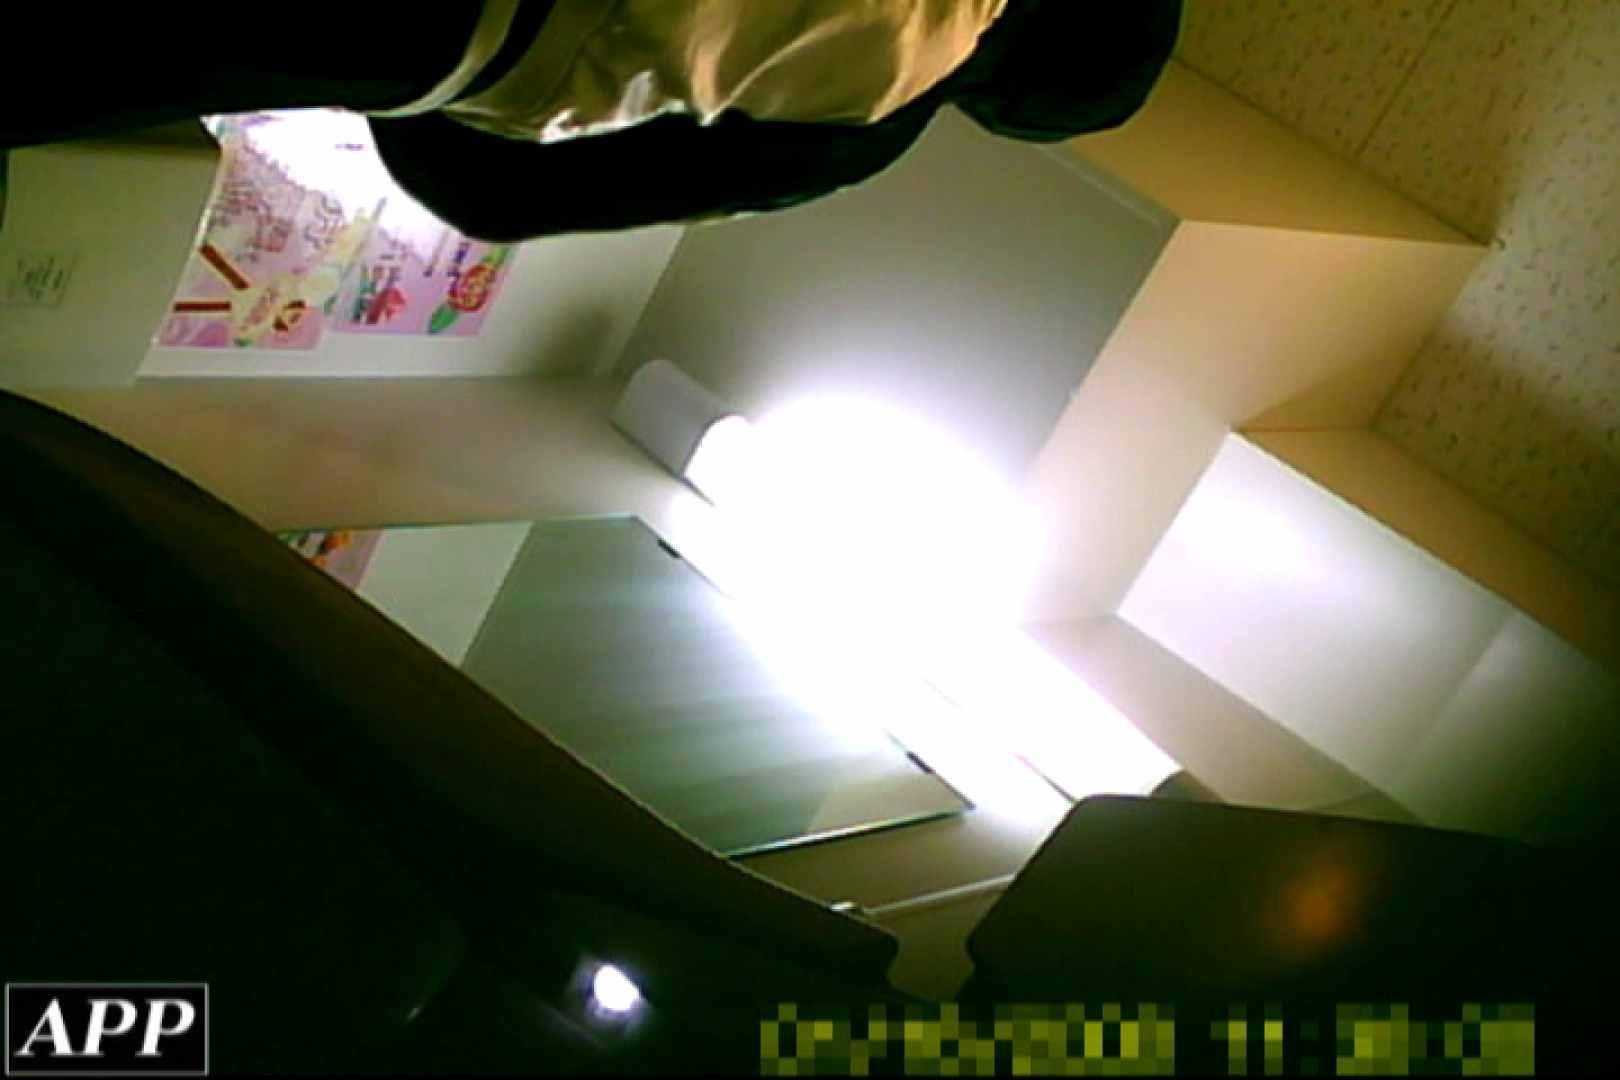 3視点洗面所 vol.127 OLハメ撮り  22Pix 8